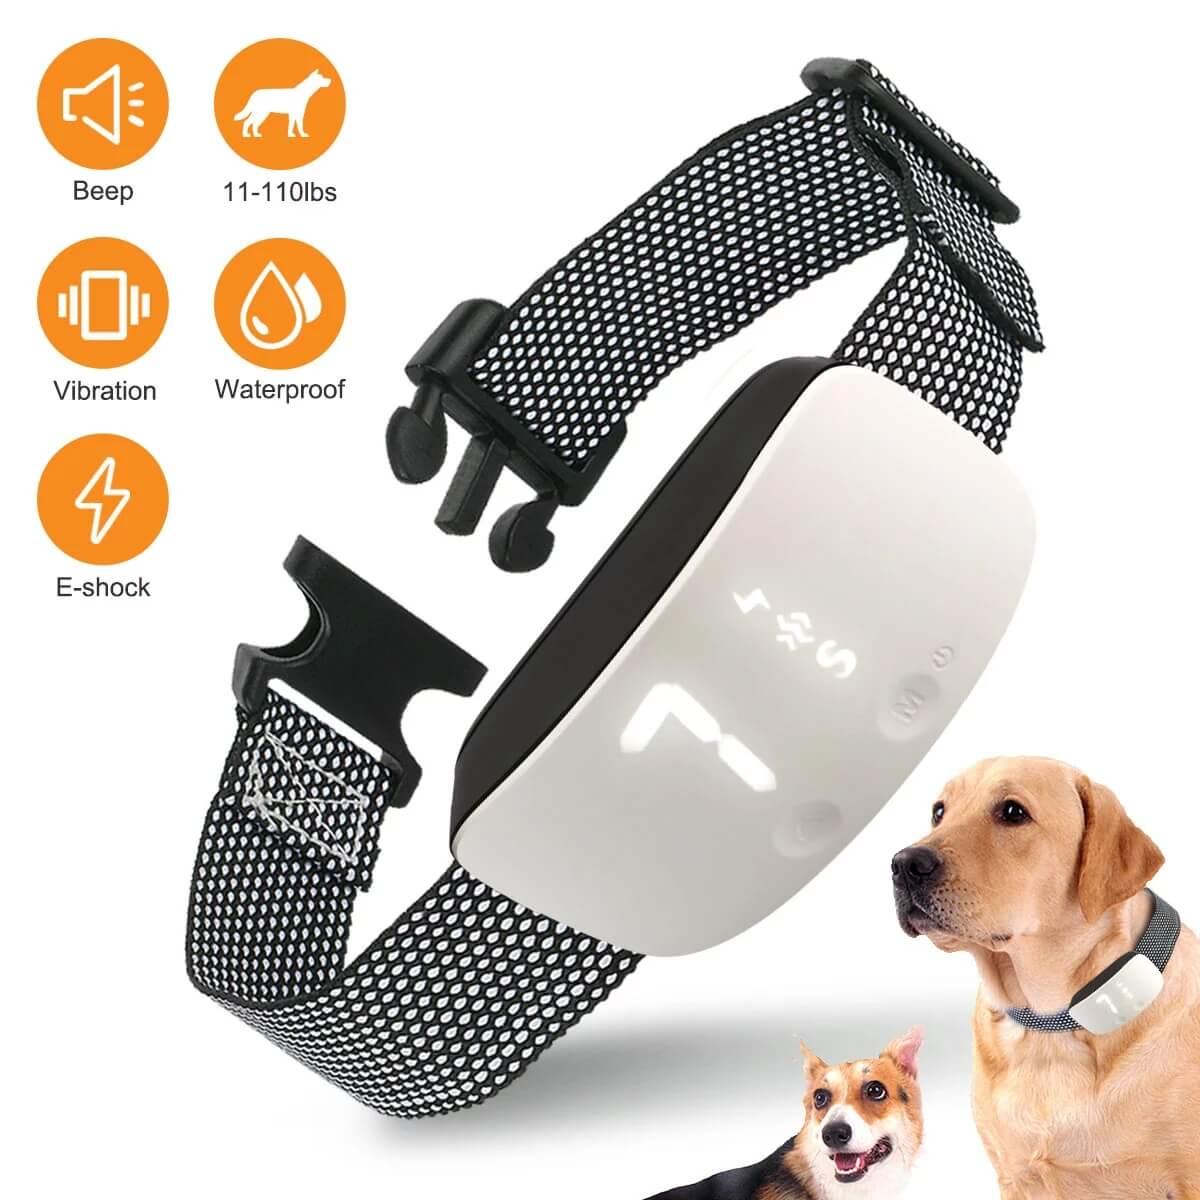 Best Anti-Bark Petsasa Rechargeable Dog Bark Training Collar in Kenya